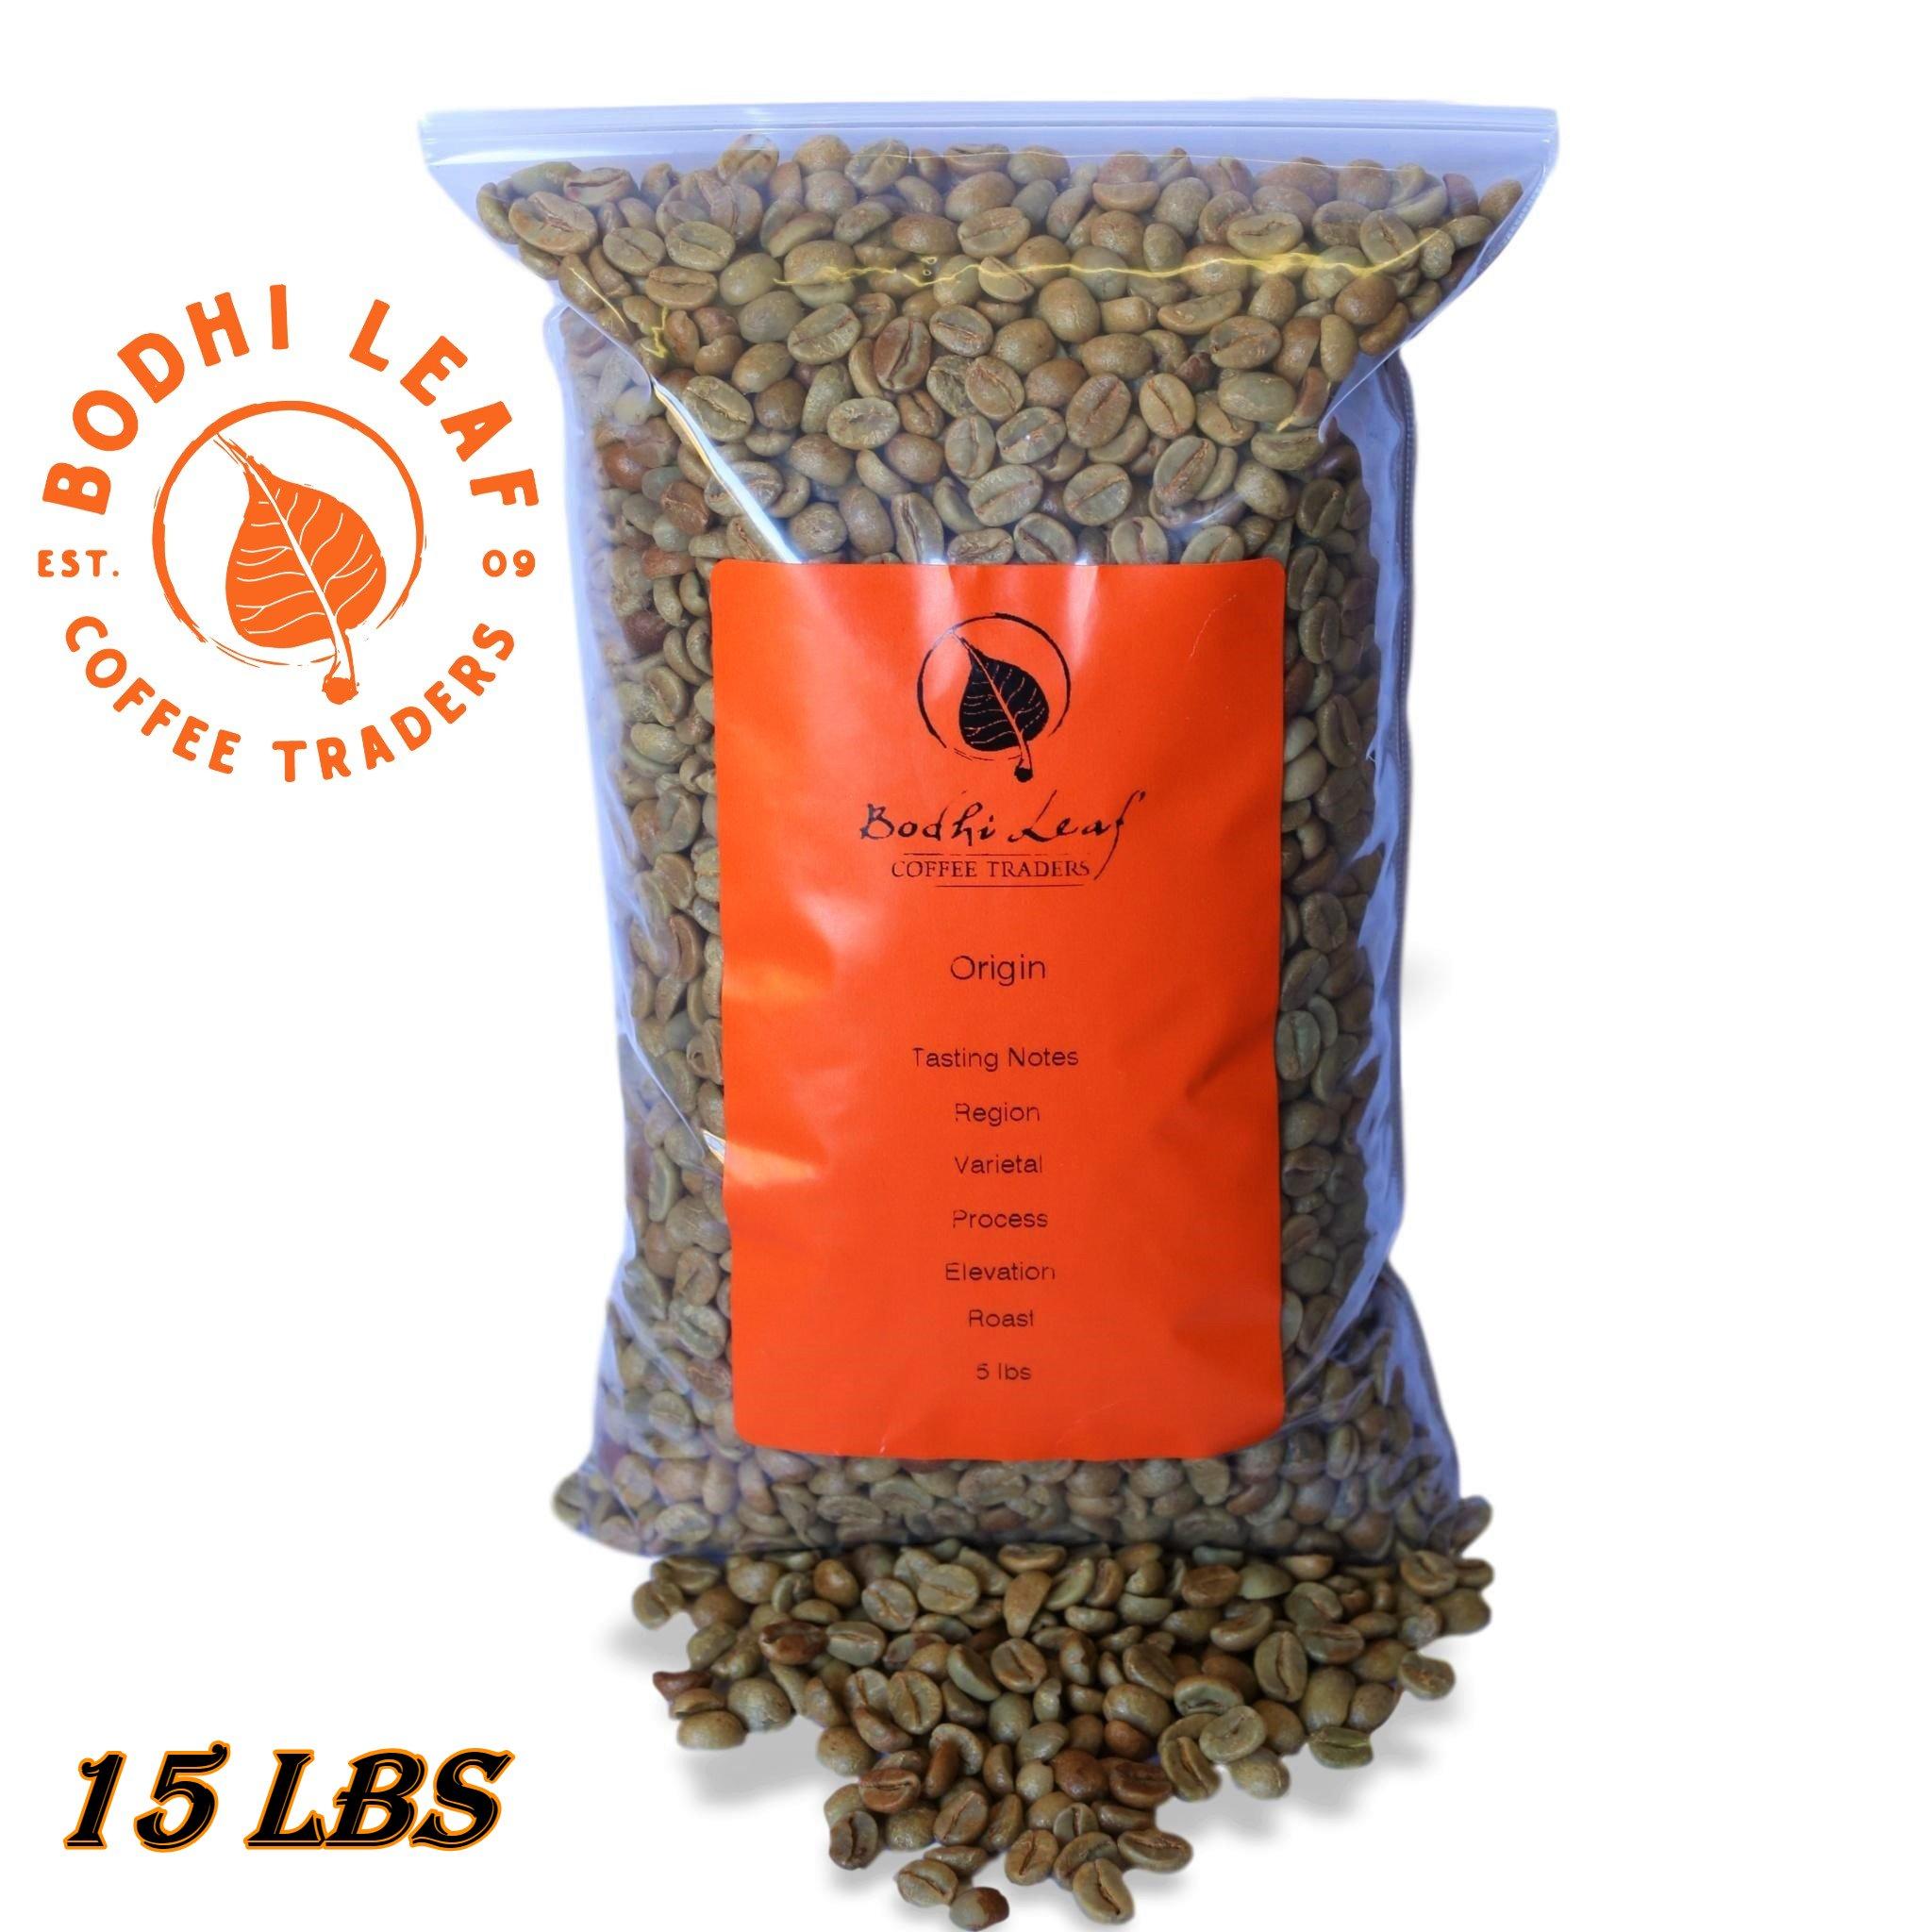 15 LBS Panama Finca Santa Teresa Washed Green Coffee 100% Specialty Arabica Caffeinated Beans